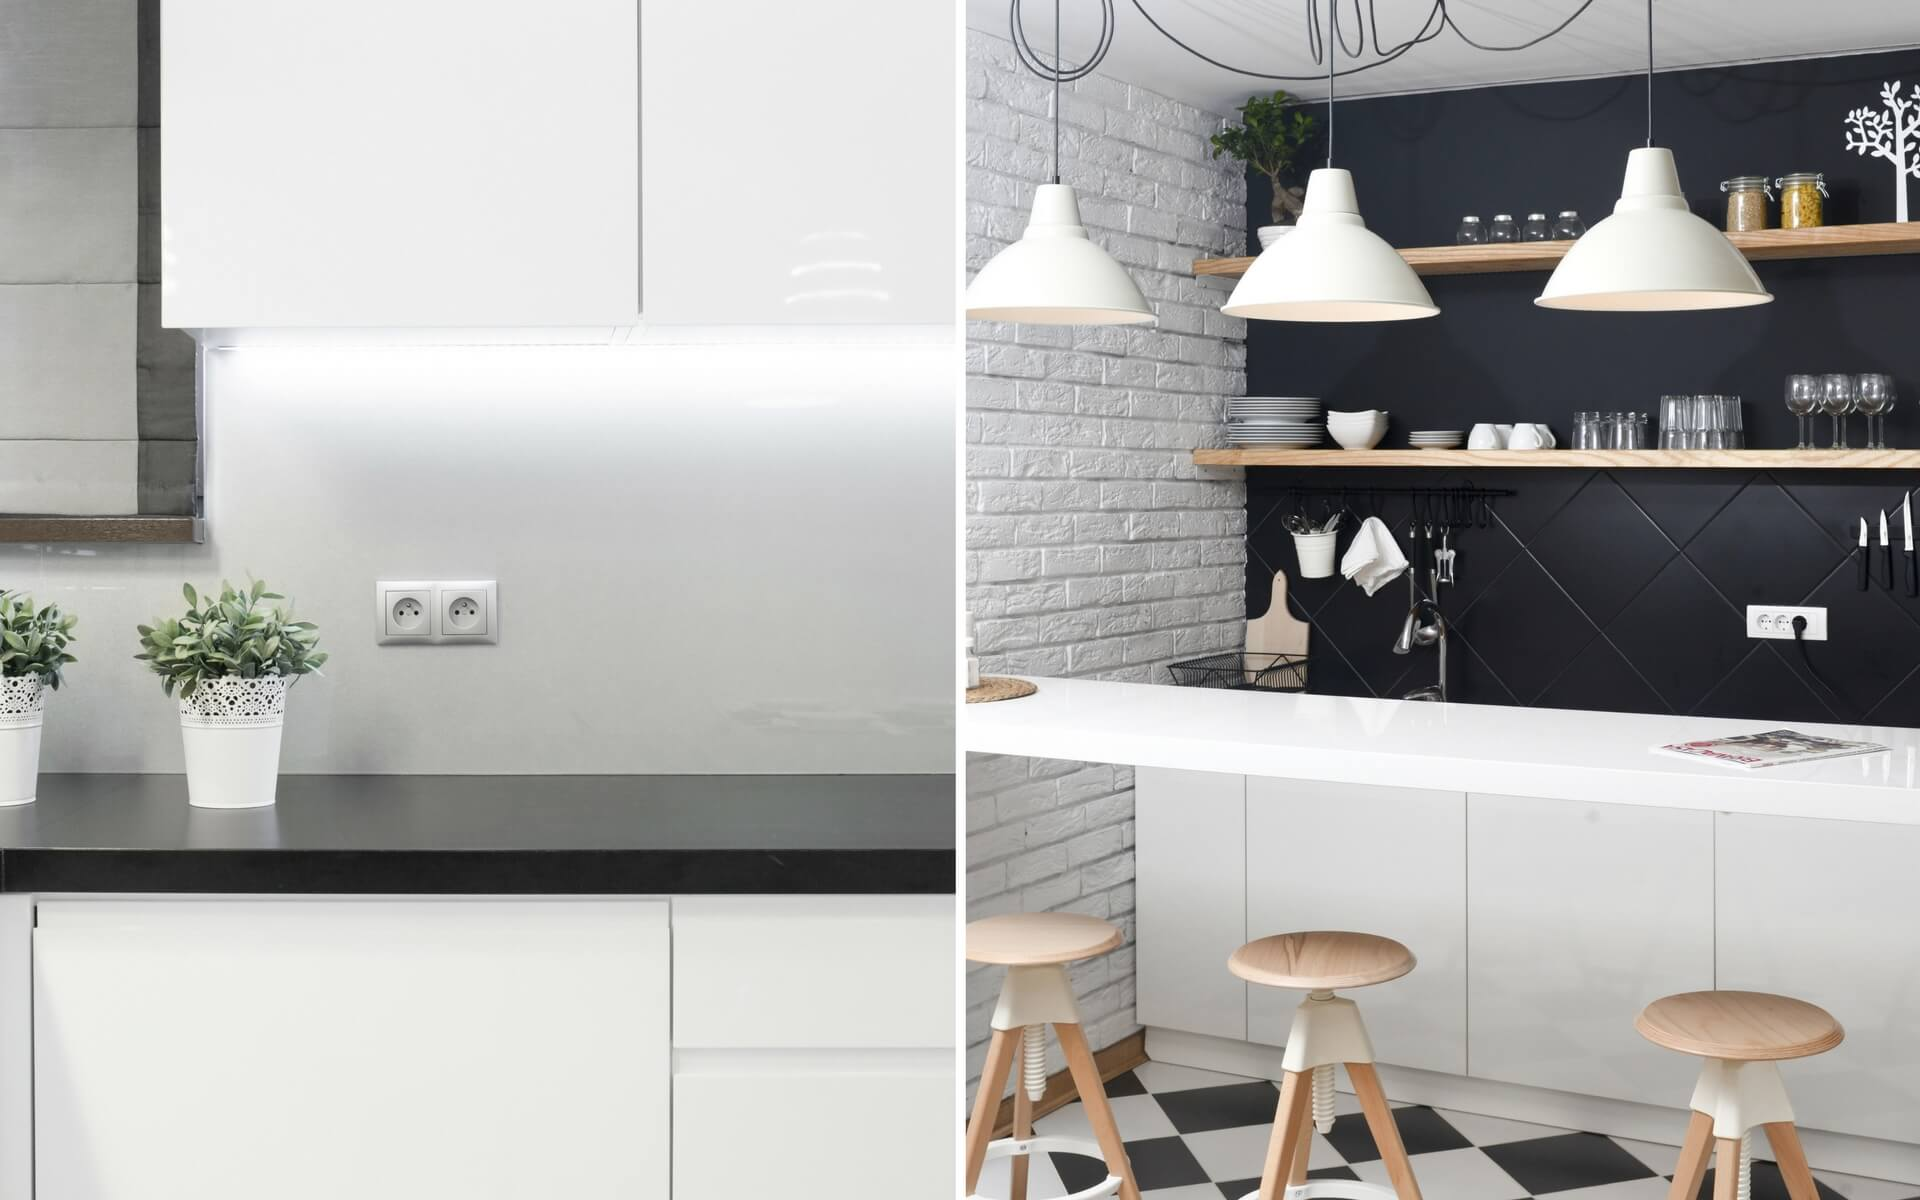 Arredare una piccola cucina: consigli pratici | Blog Oknoplast